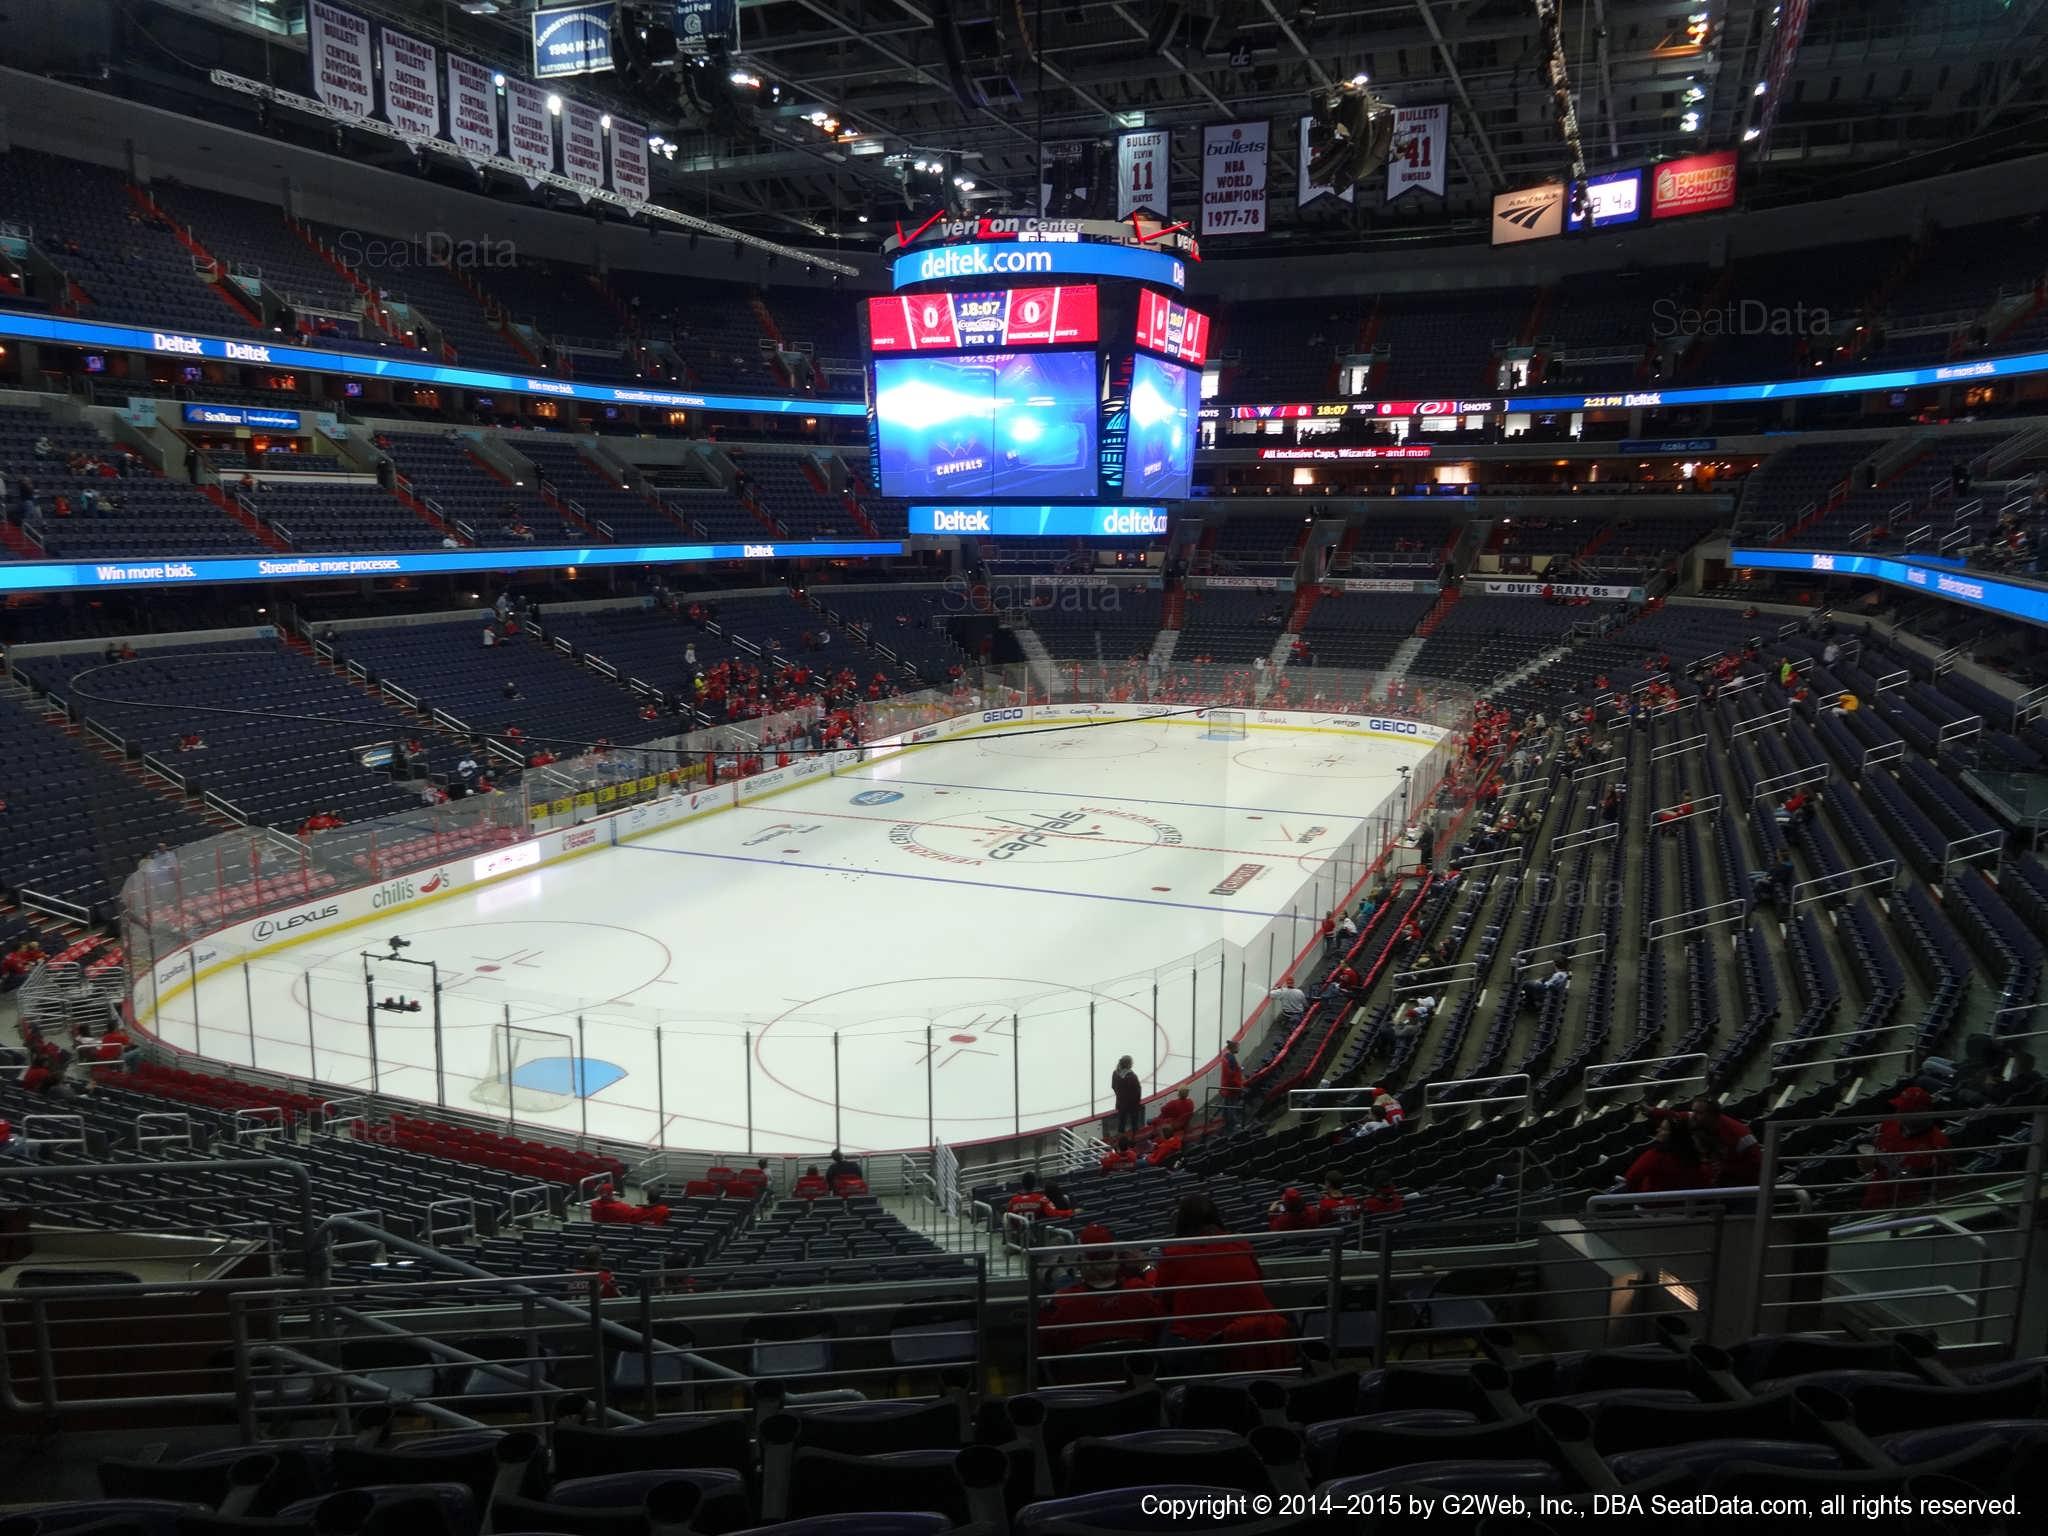 b2913acae5e Capital One Arena Section 209 - Washington Capitals - RateYourSeats.com